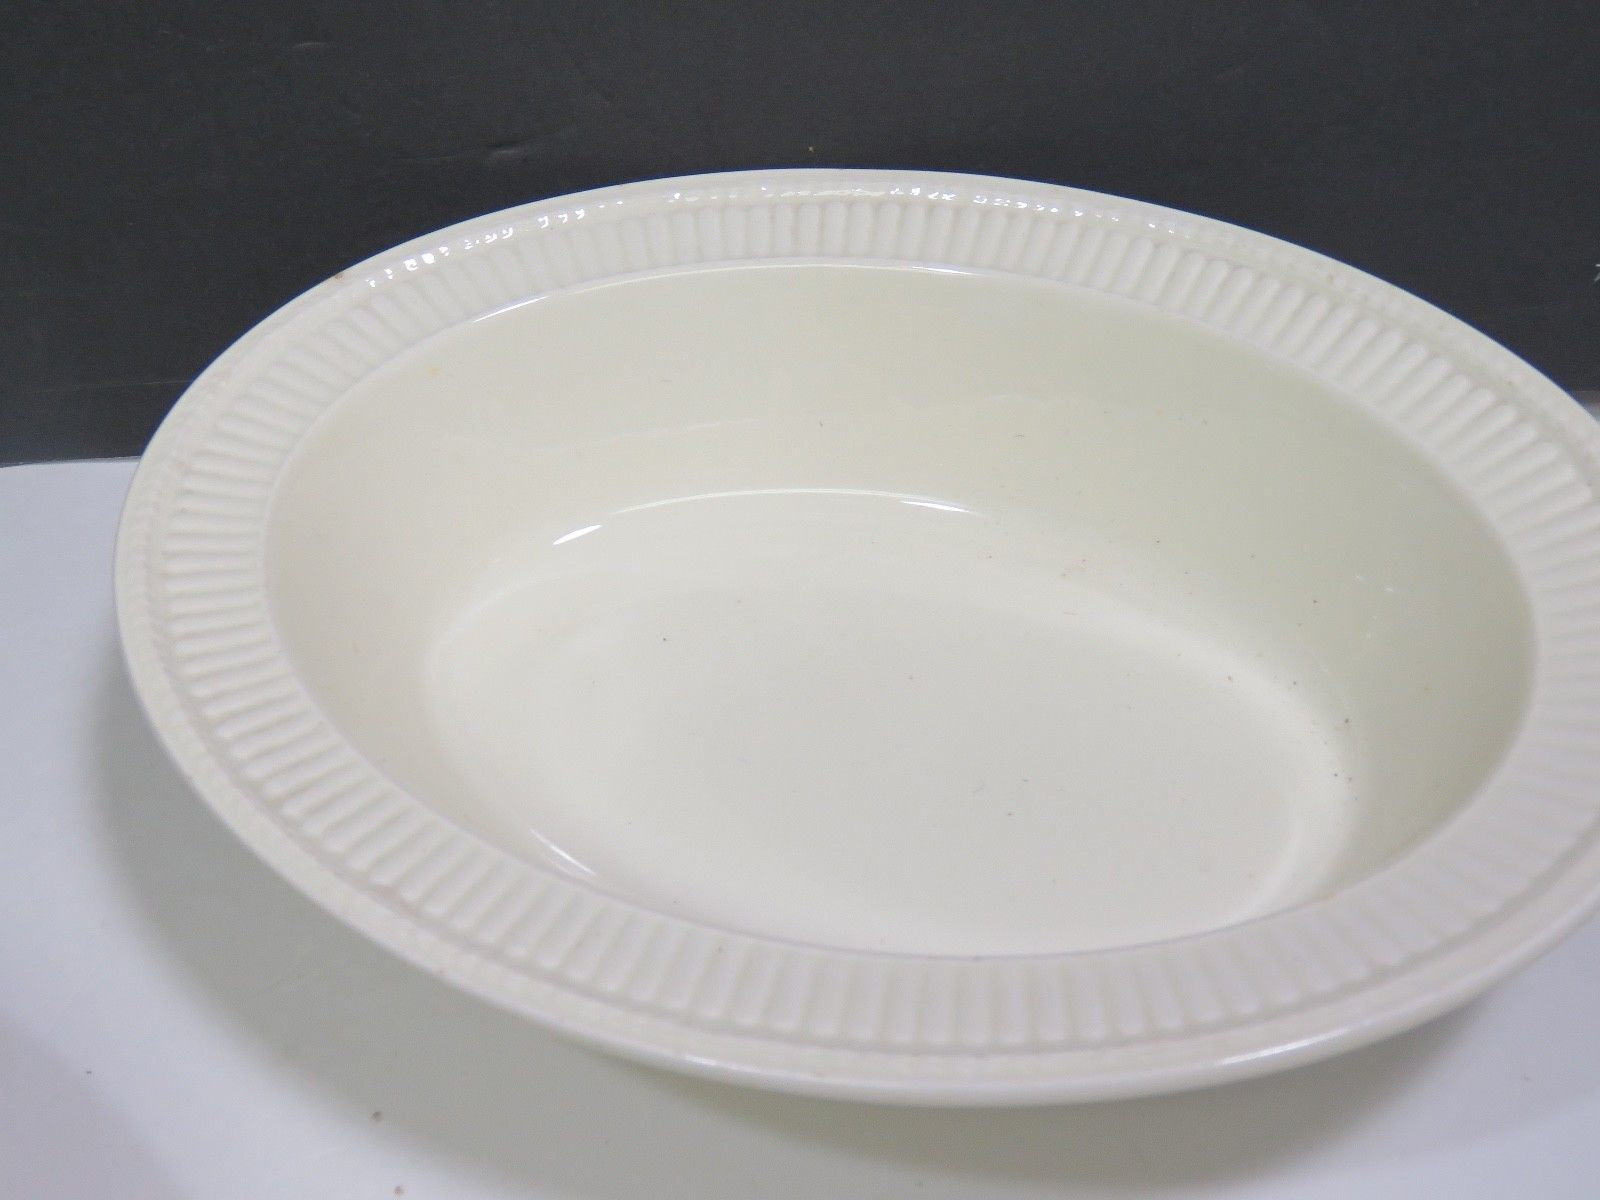 "2 Wedgwood Edme Creamware Oval Vegetable Serving Bowls 10.75"" image 3"